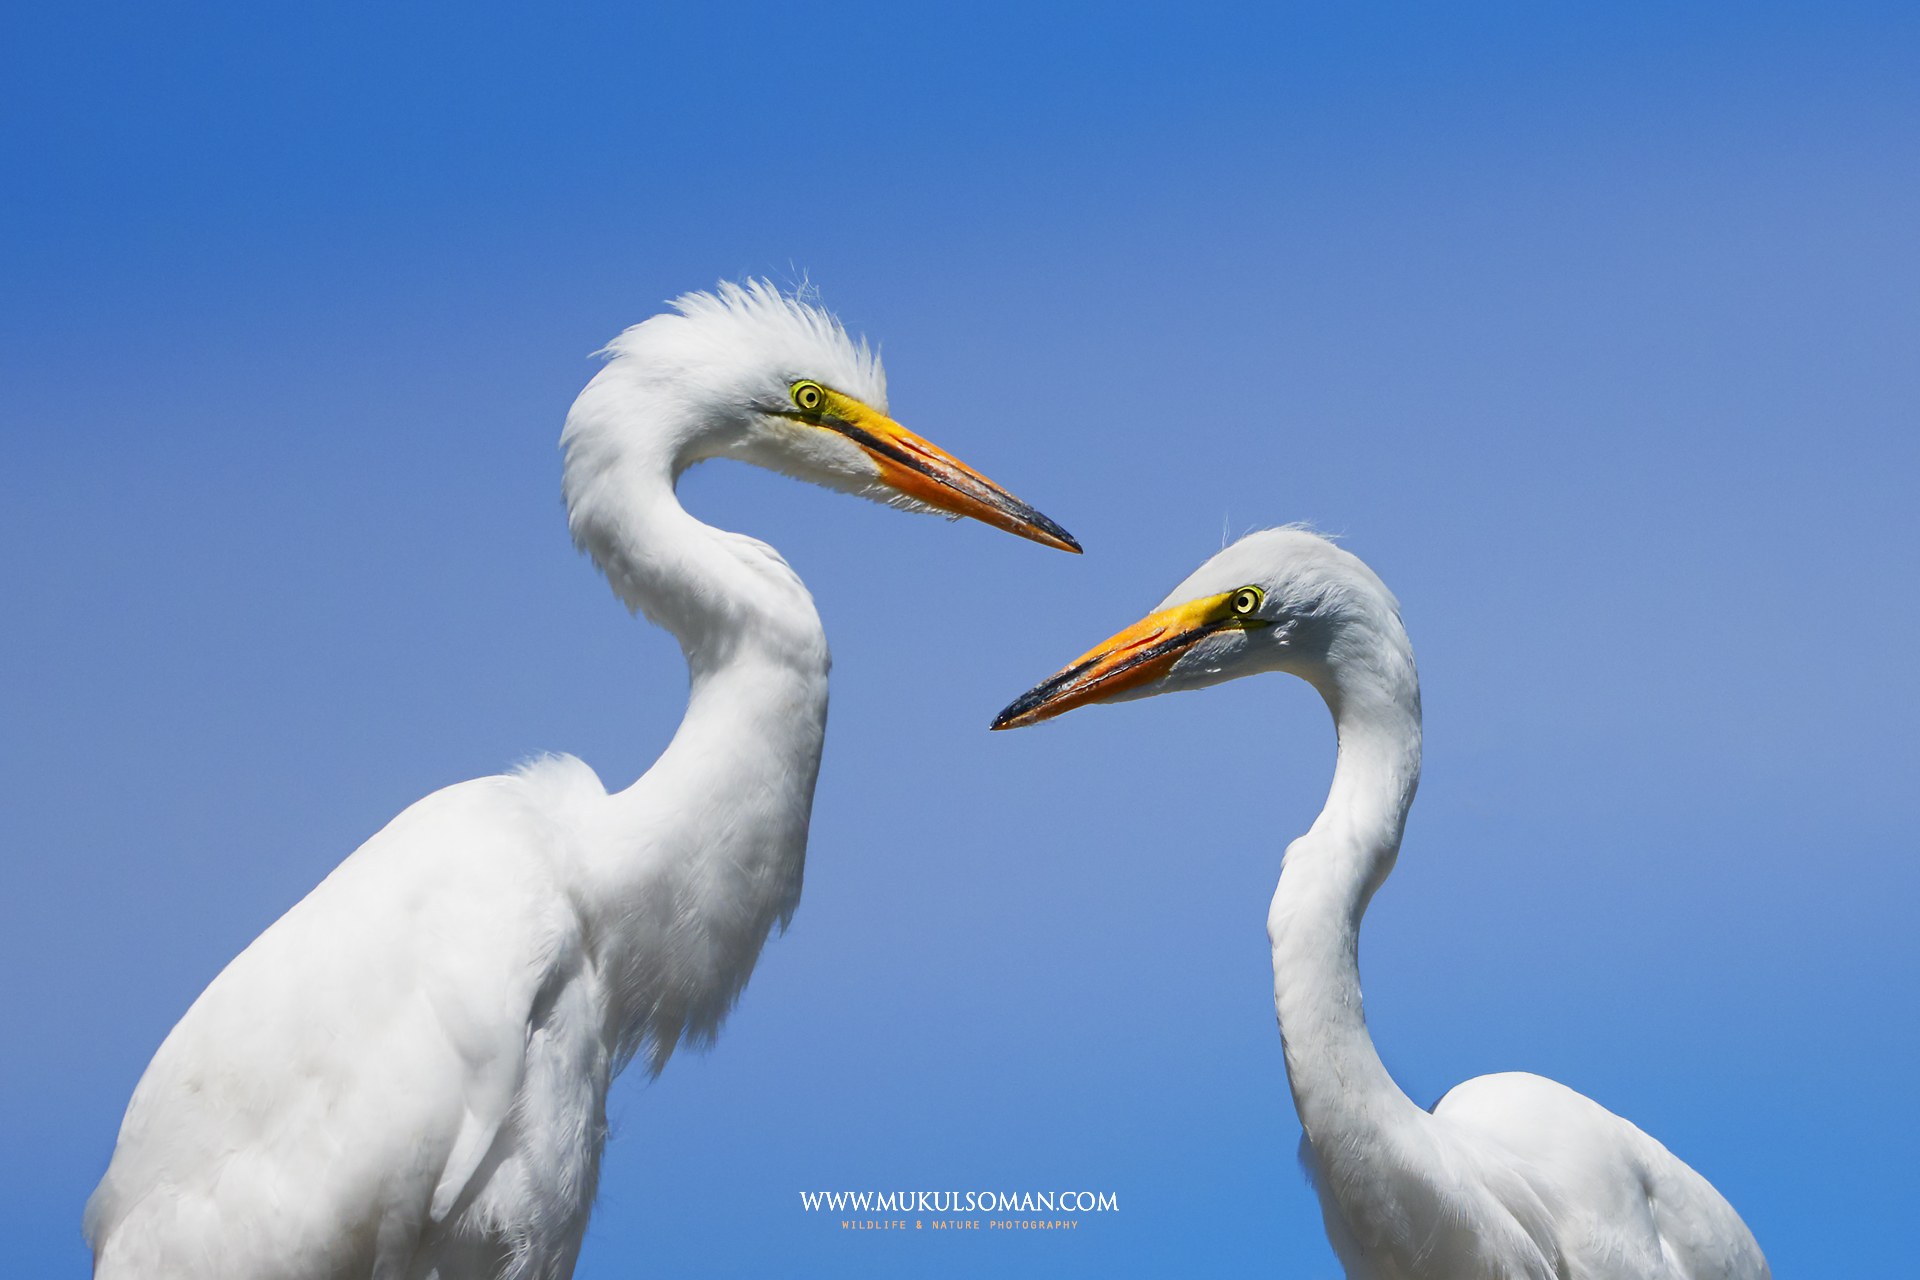 Pair of juvenile Great Egrets.  Camera : Nikon D500 | Focal Length : 600mm |Exposure : 1/2000 | Aperture : f/8 |ISO : 400